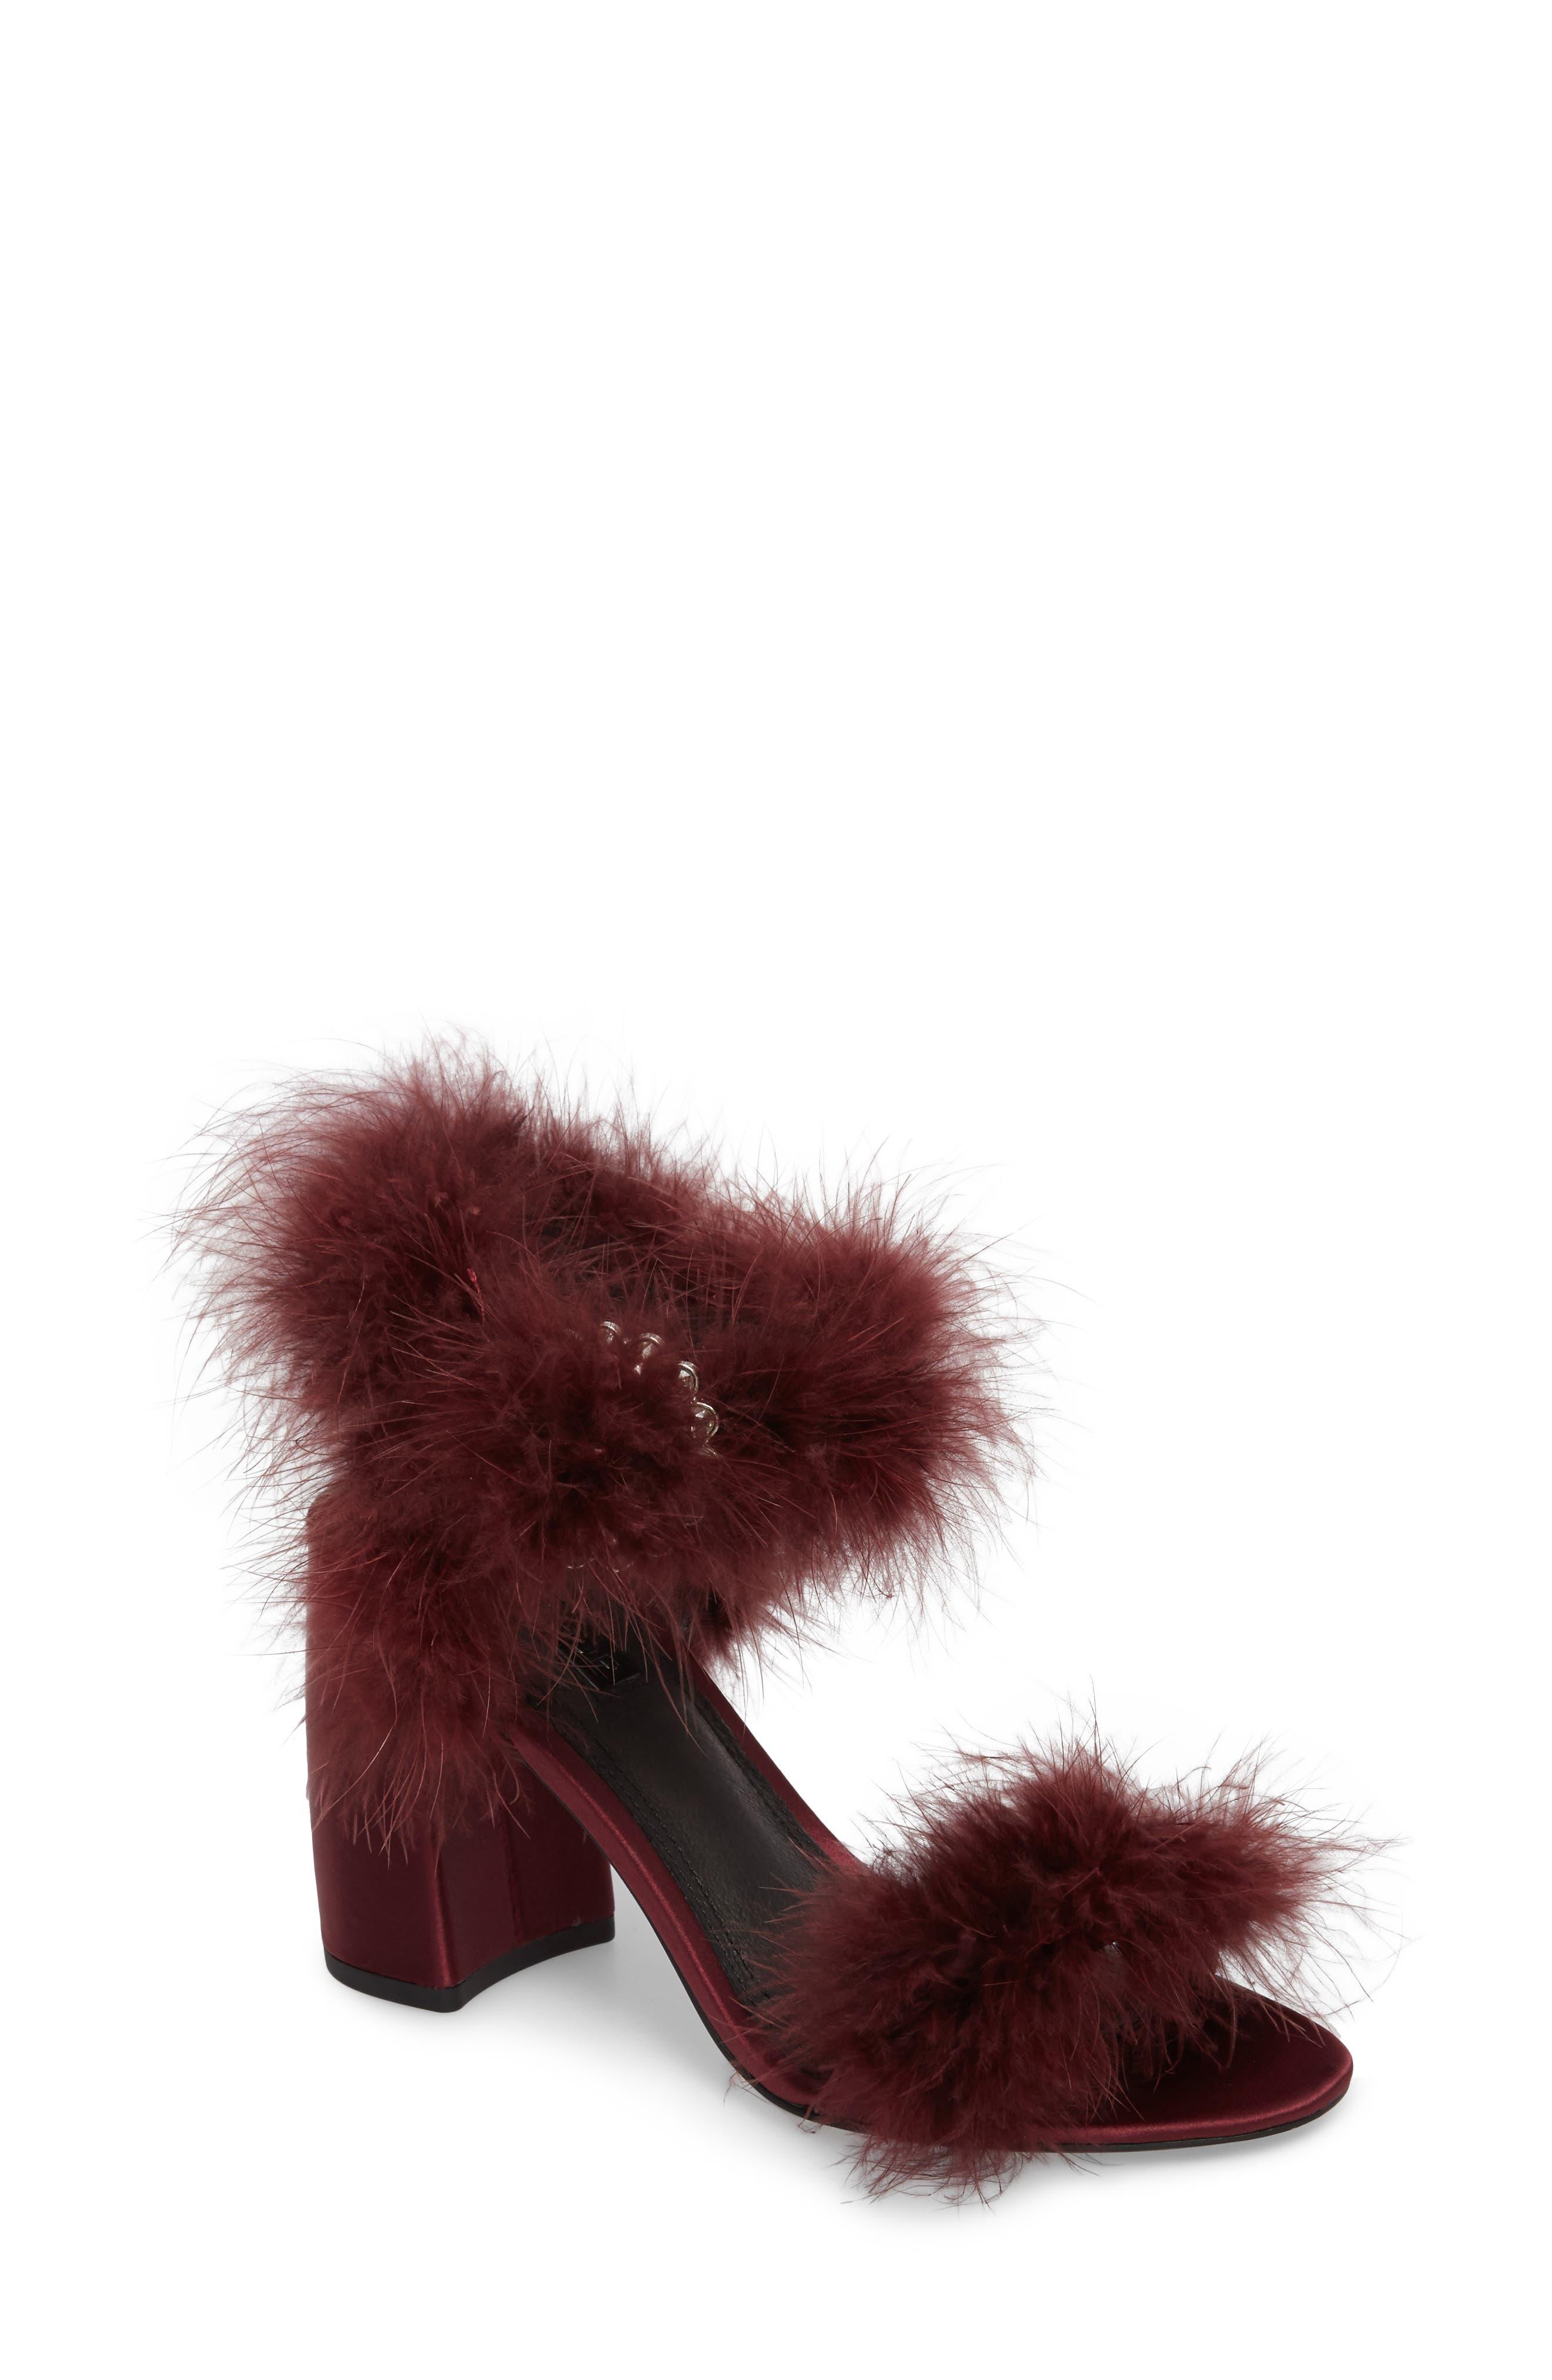 Alternate Image 1 Selected - Topshop Maribou Feather Sandal (Women)